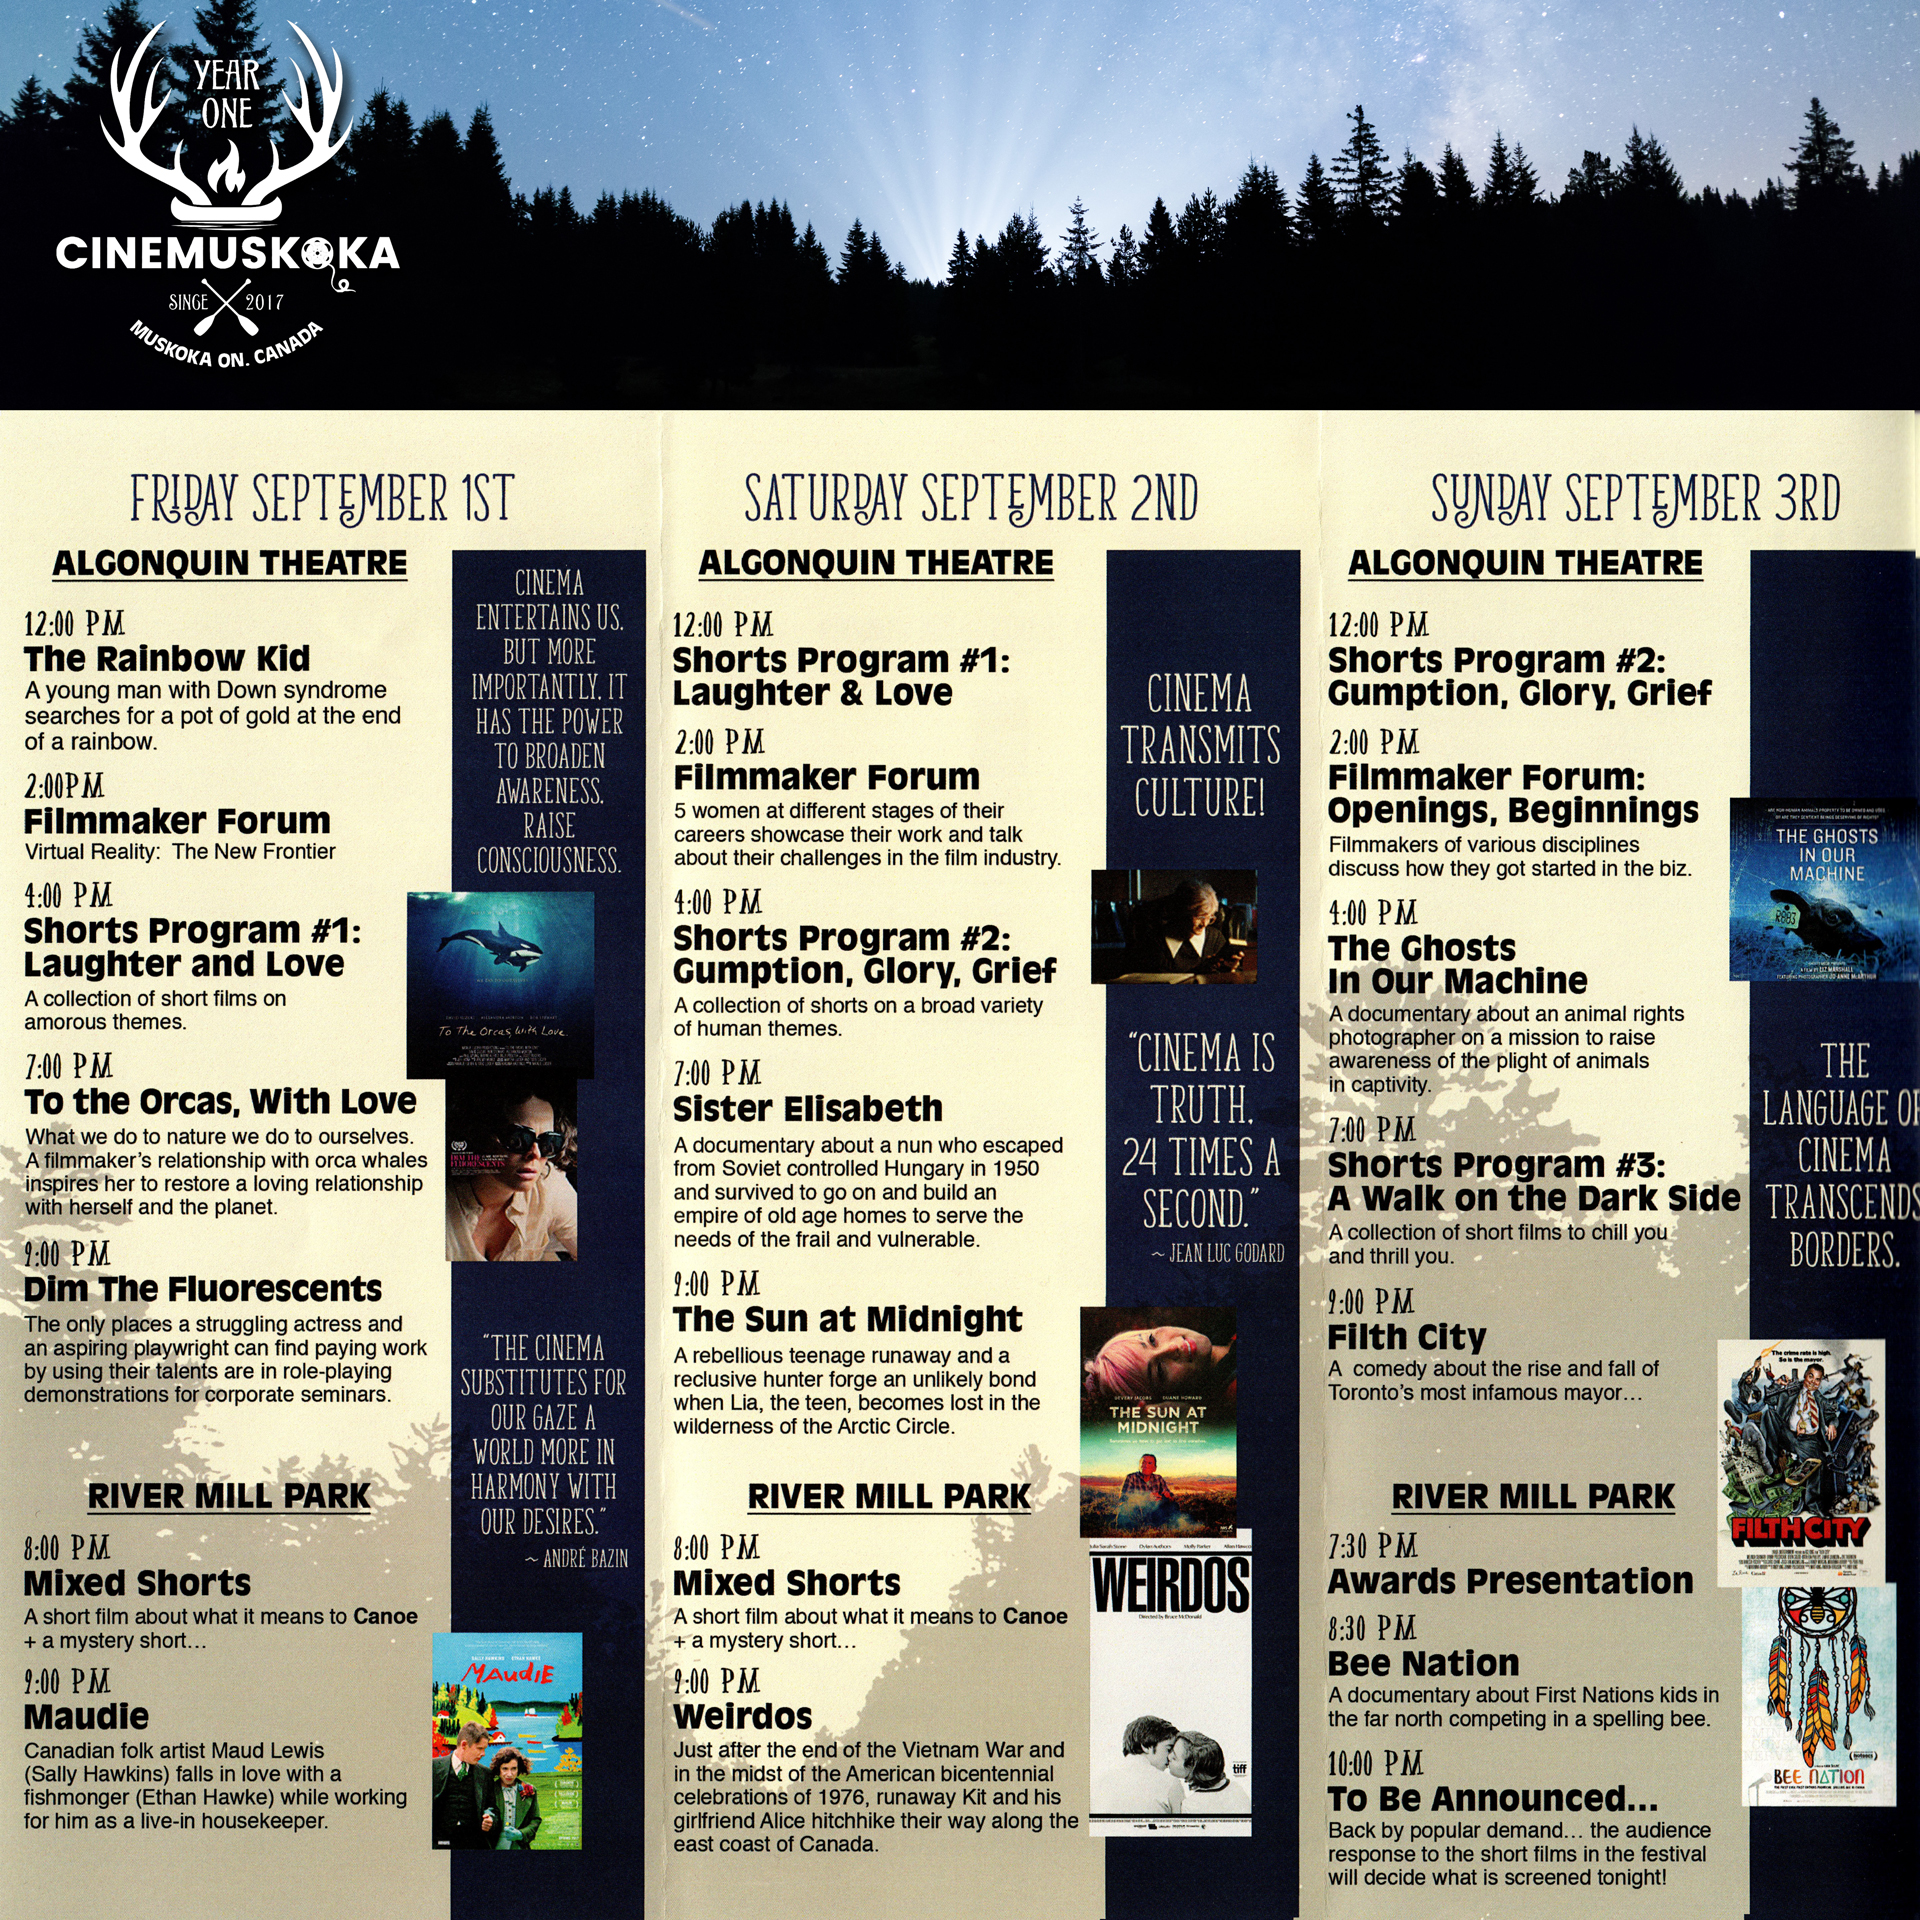 CineMuskoka Program Guide 2017